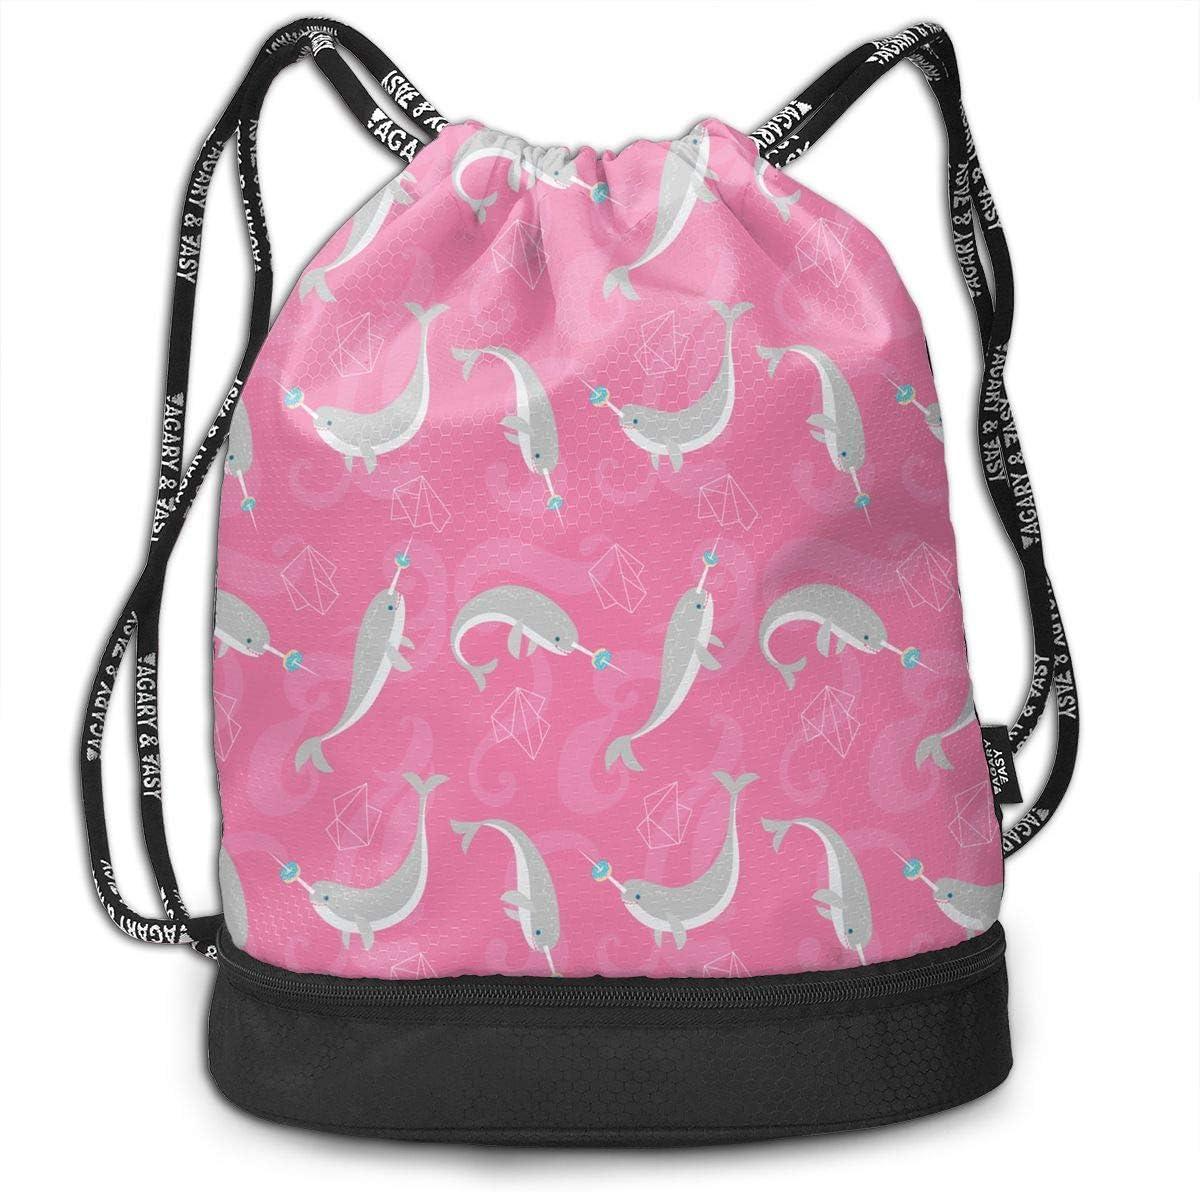 Zhangyi Doughnut Narwhal Drawstring Backpack Sports Gym Cinch Sack Bag for Men /& Women Sackpack Dance Bag